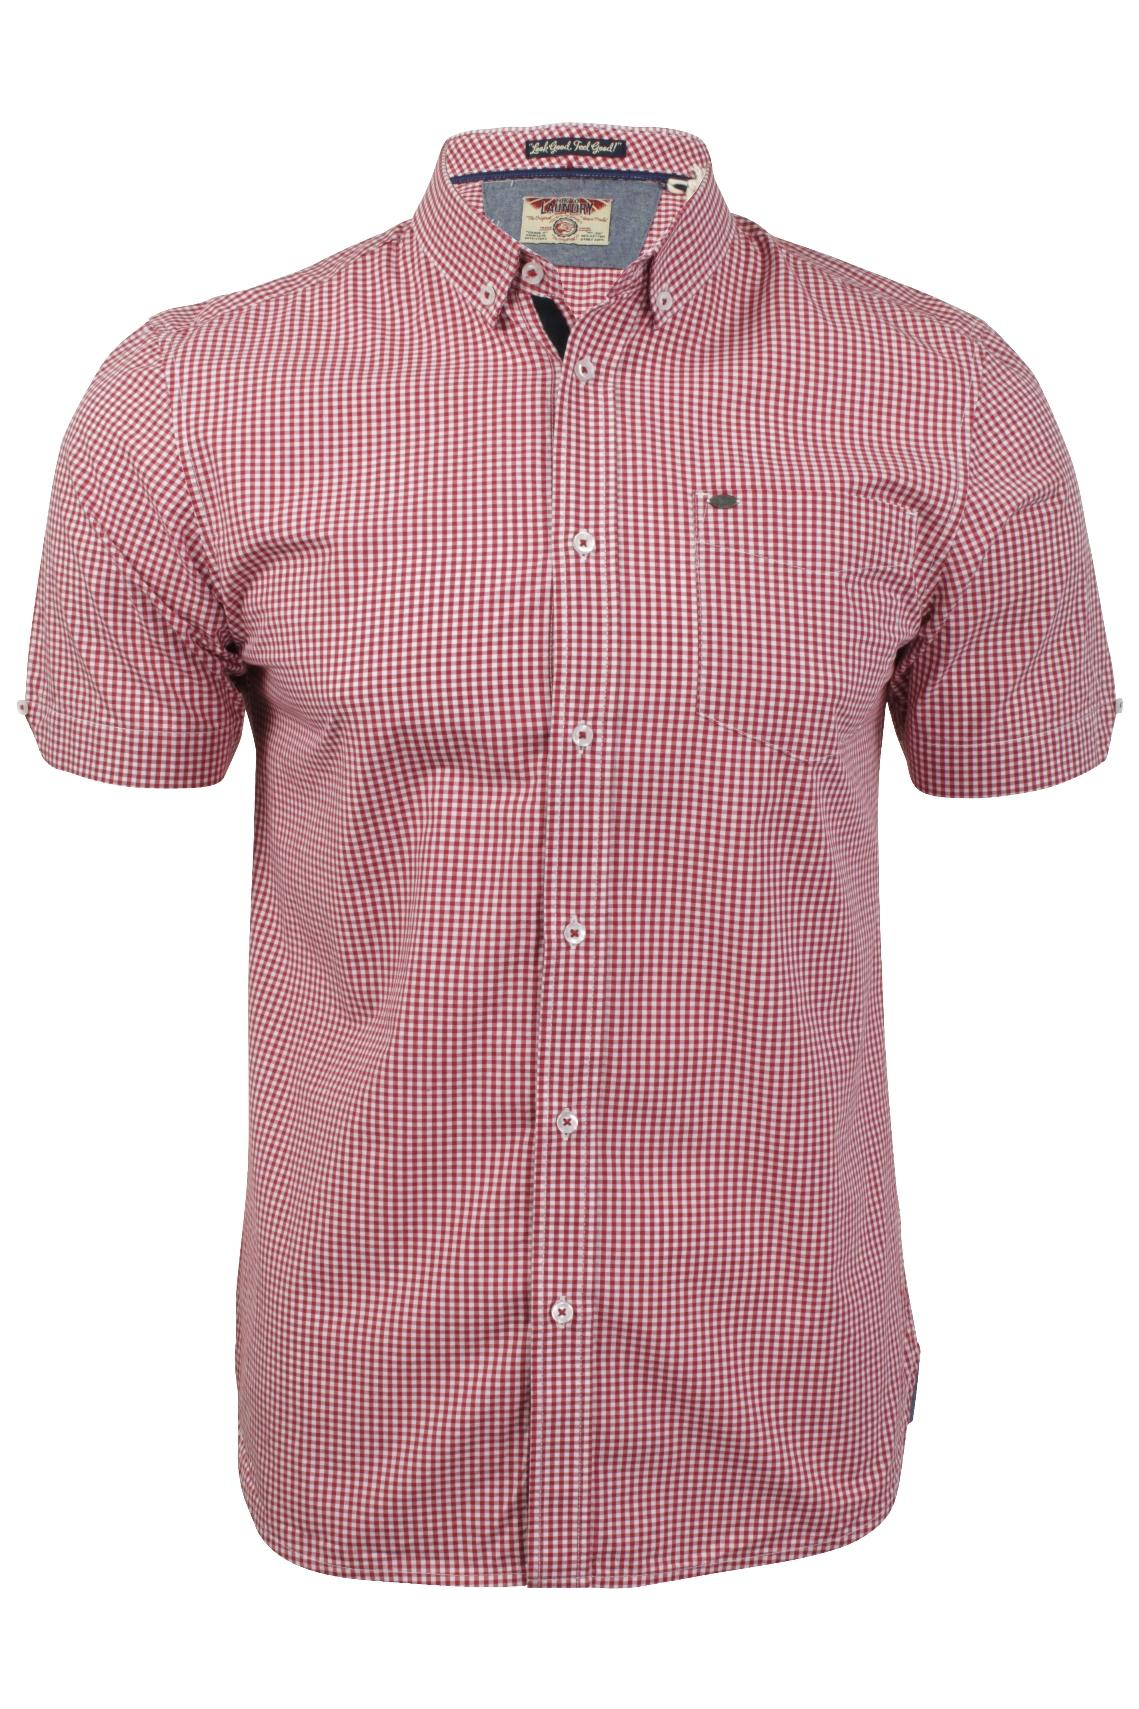 Mens gingham check shirt by tokyo laundry short sleeved ebay for Mens gingham dress shirt